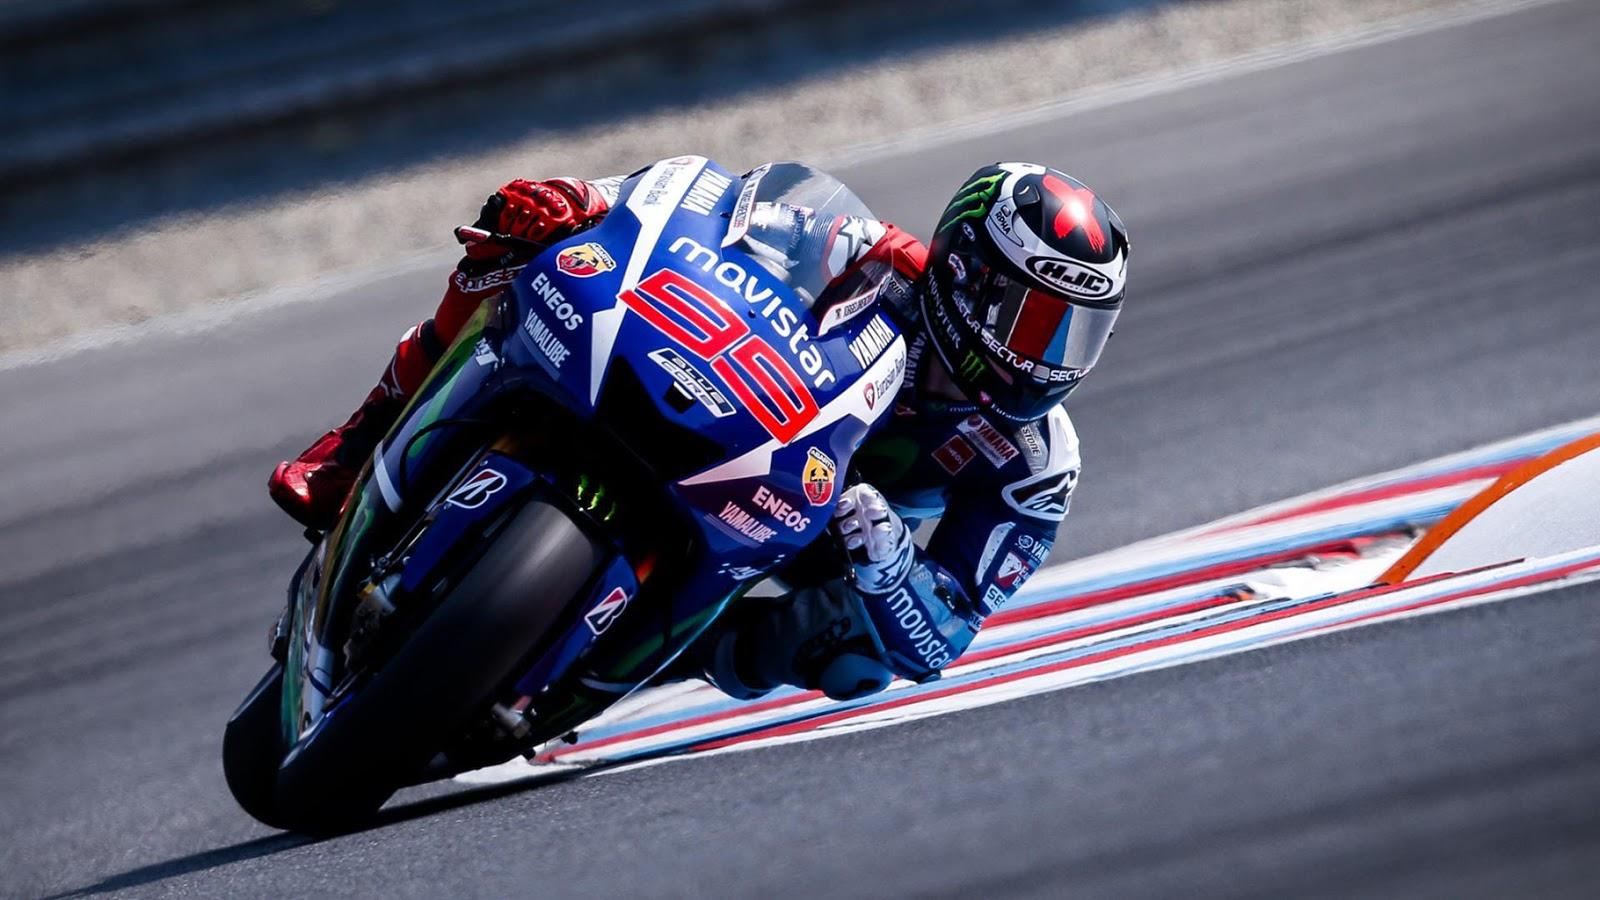 Best 10 MotoGP Wallpapers HD For Wonderful Background